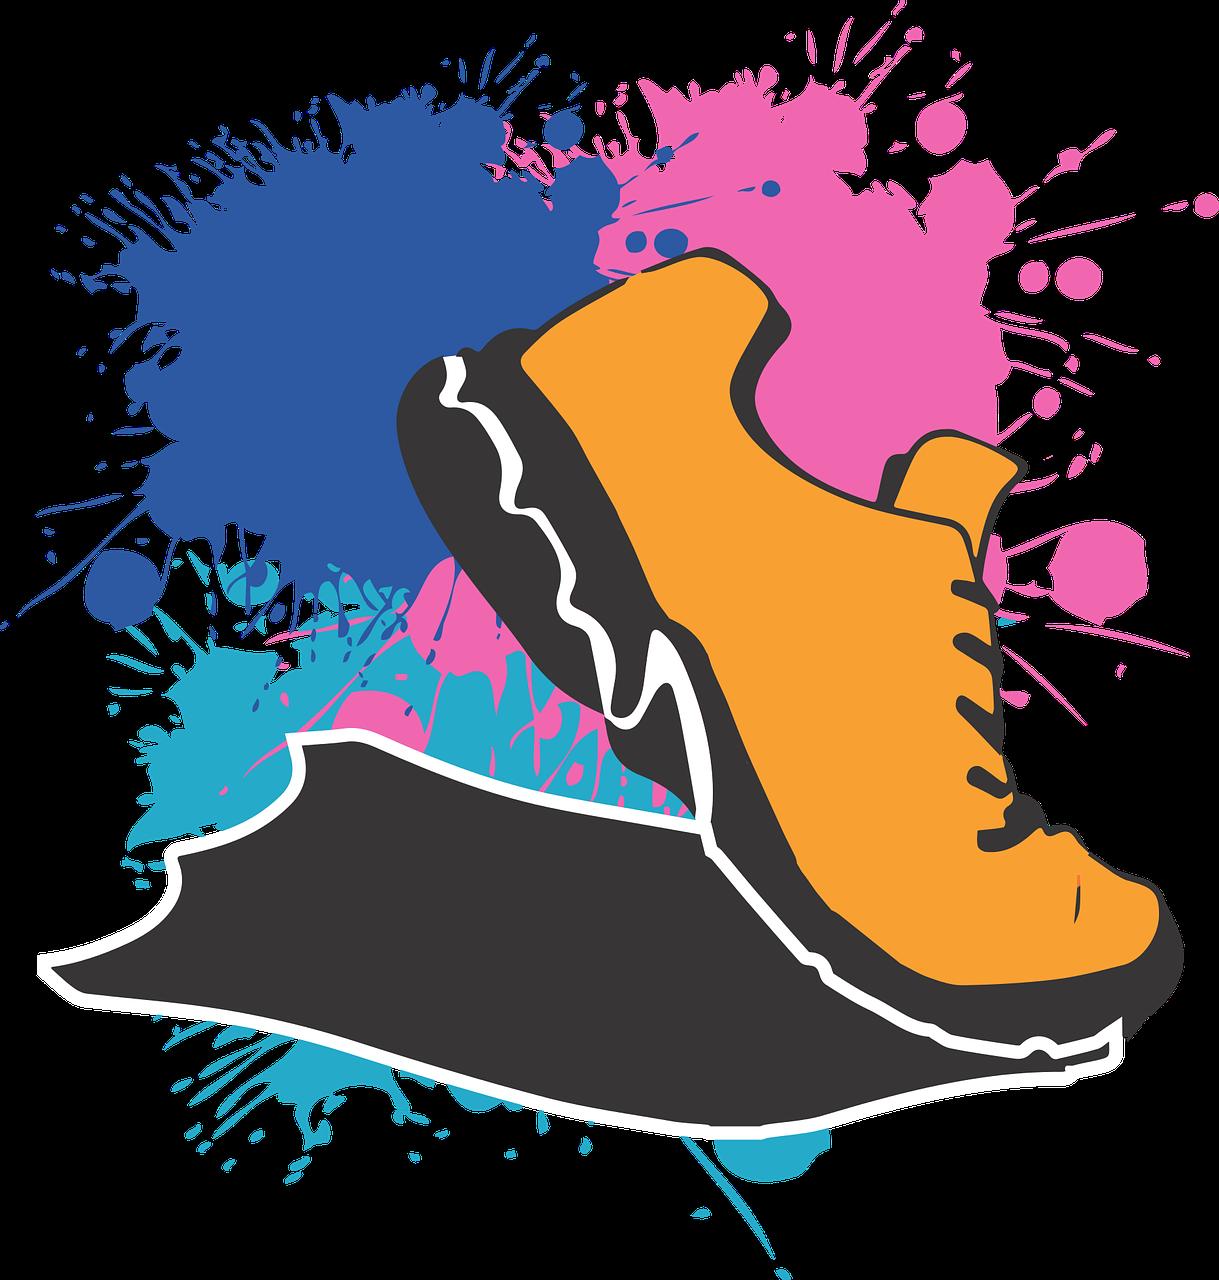 Running,shoe,marathon,5k,free vector graphics.